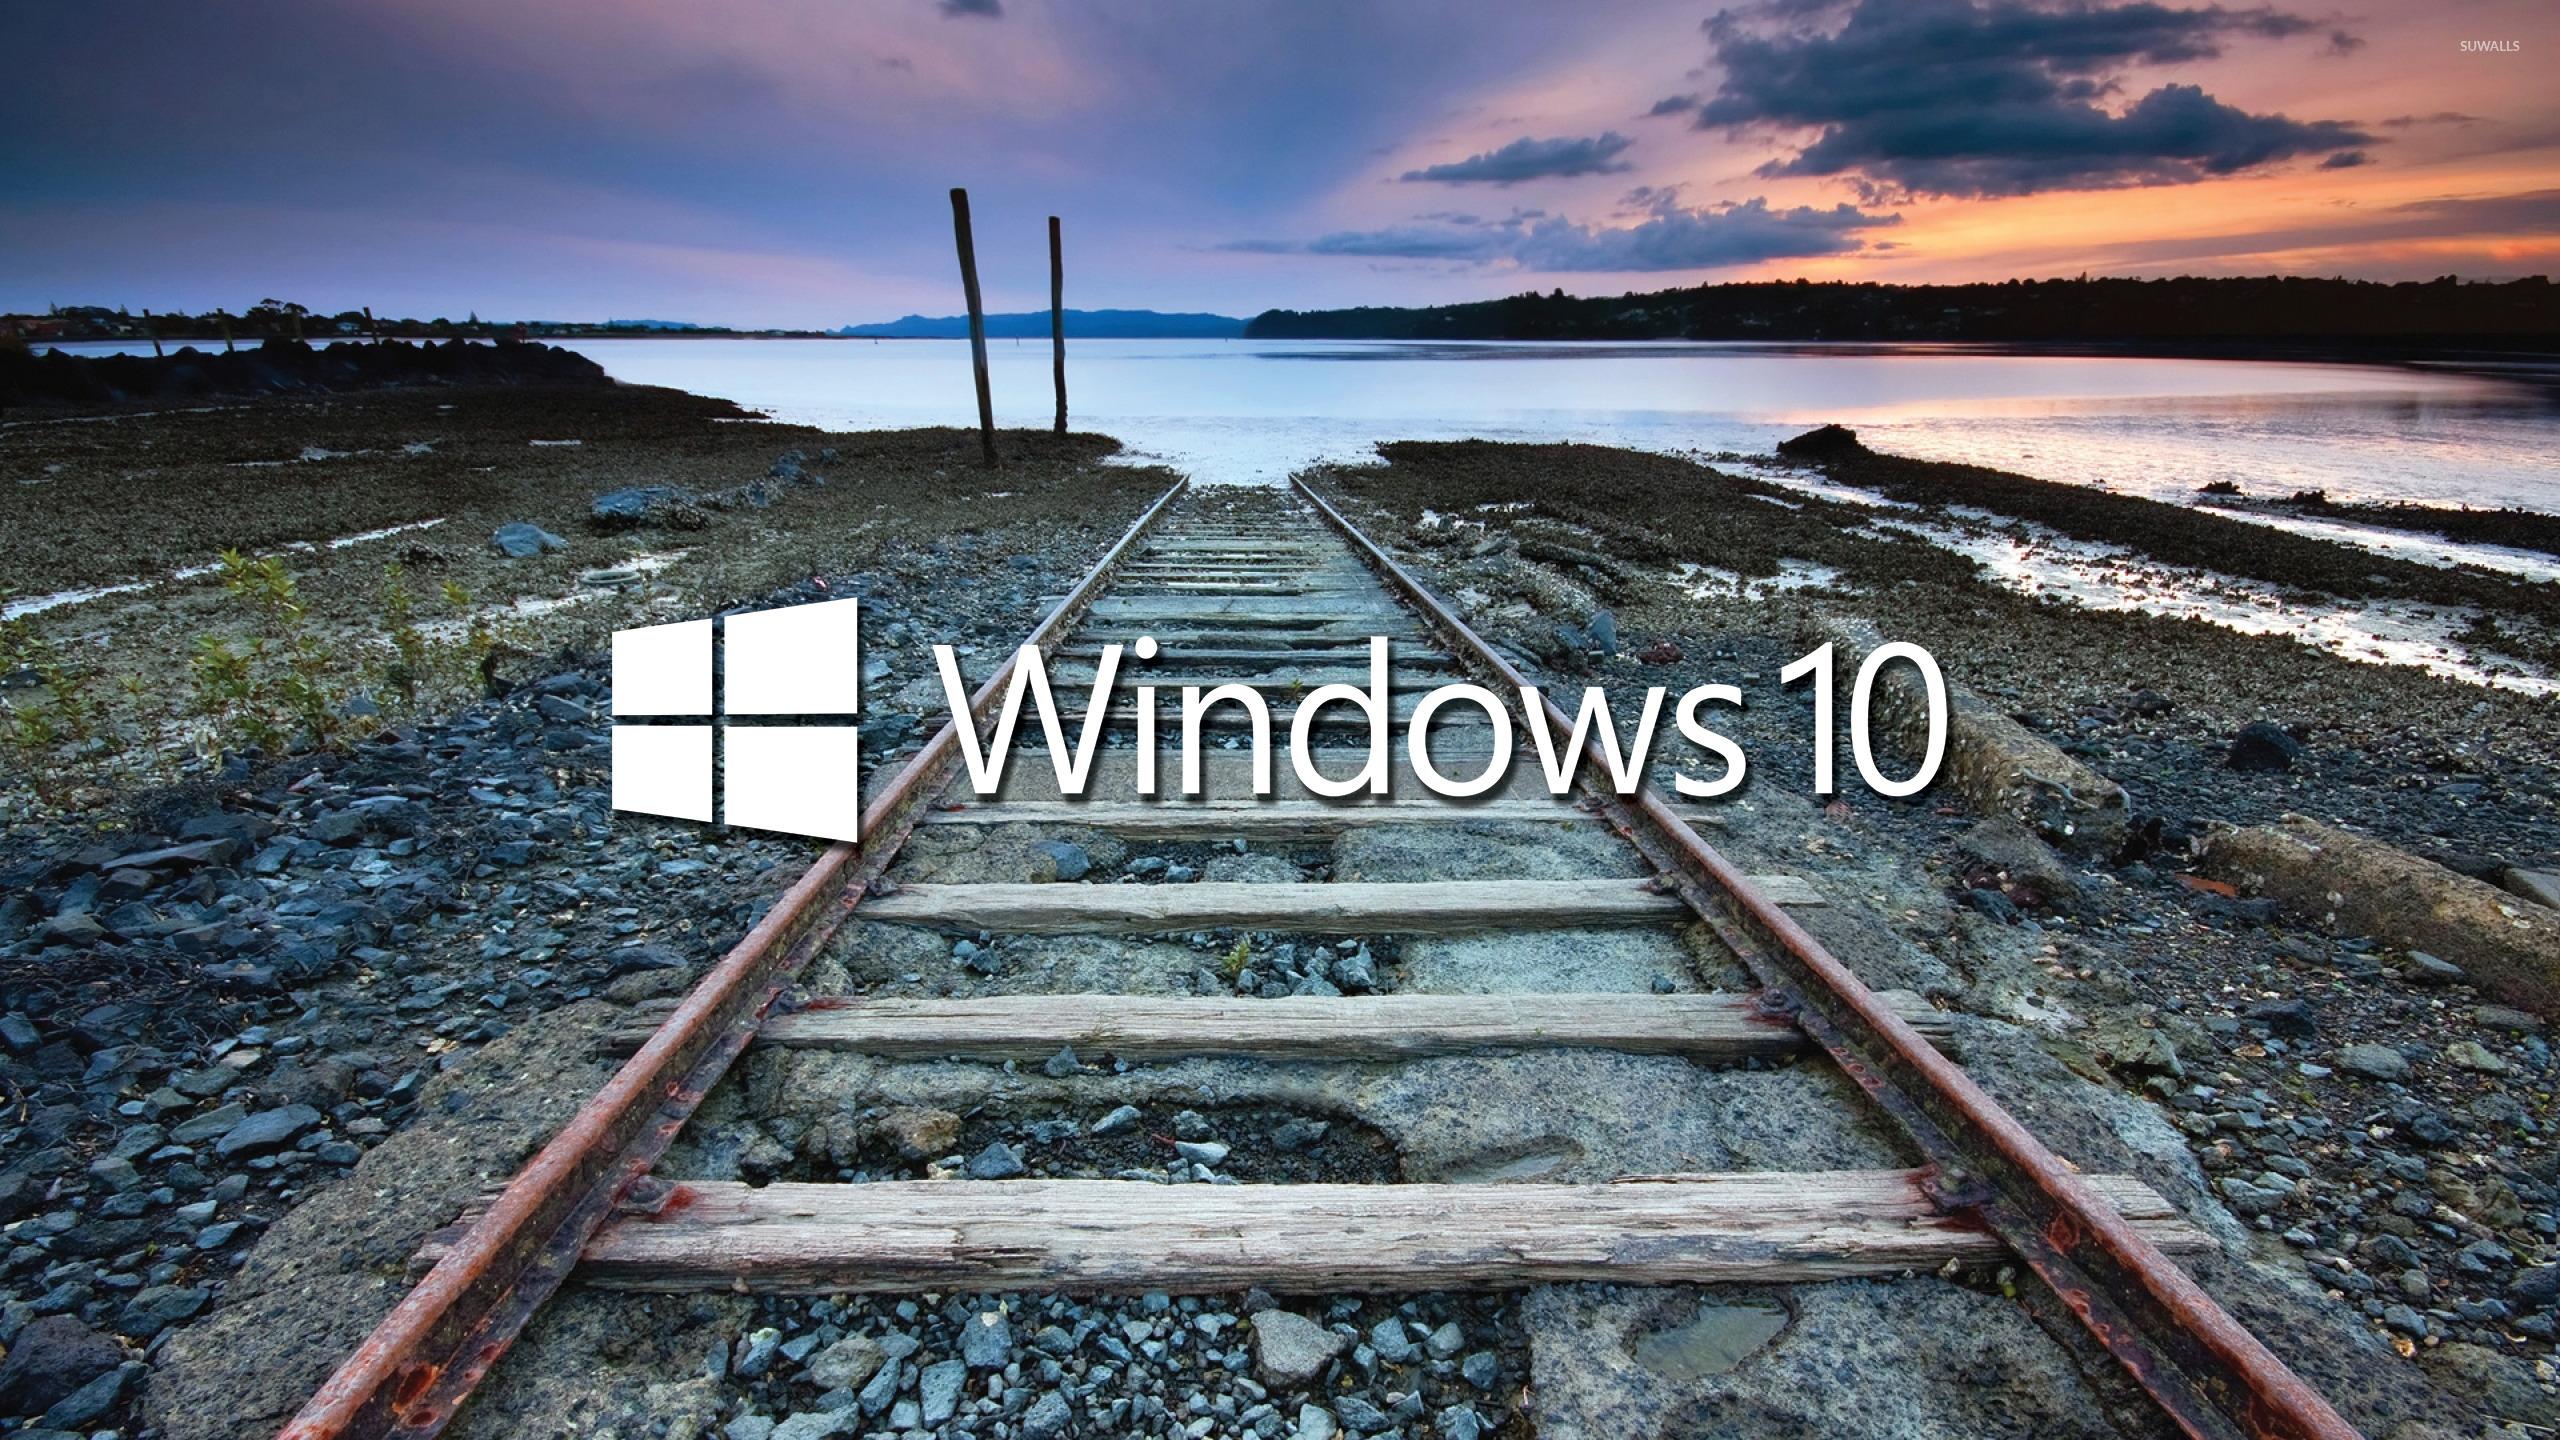 Windows 10 white text logo on the railroad tracks wallpaper 2560x1440 2560x1440